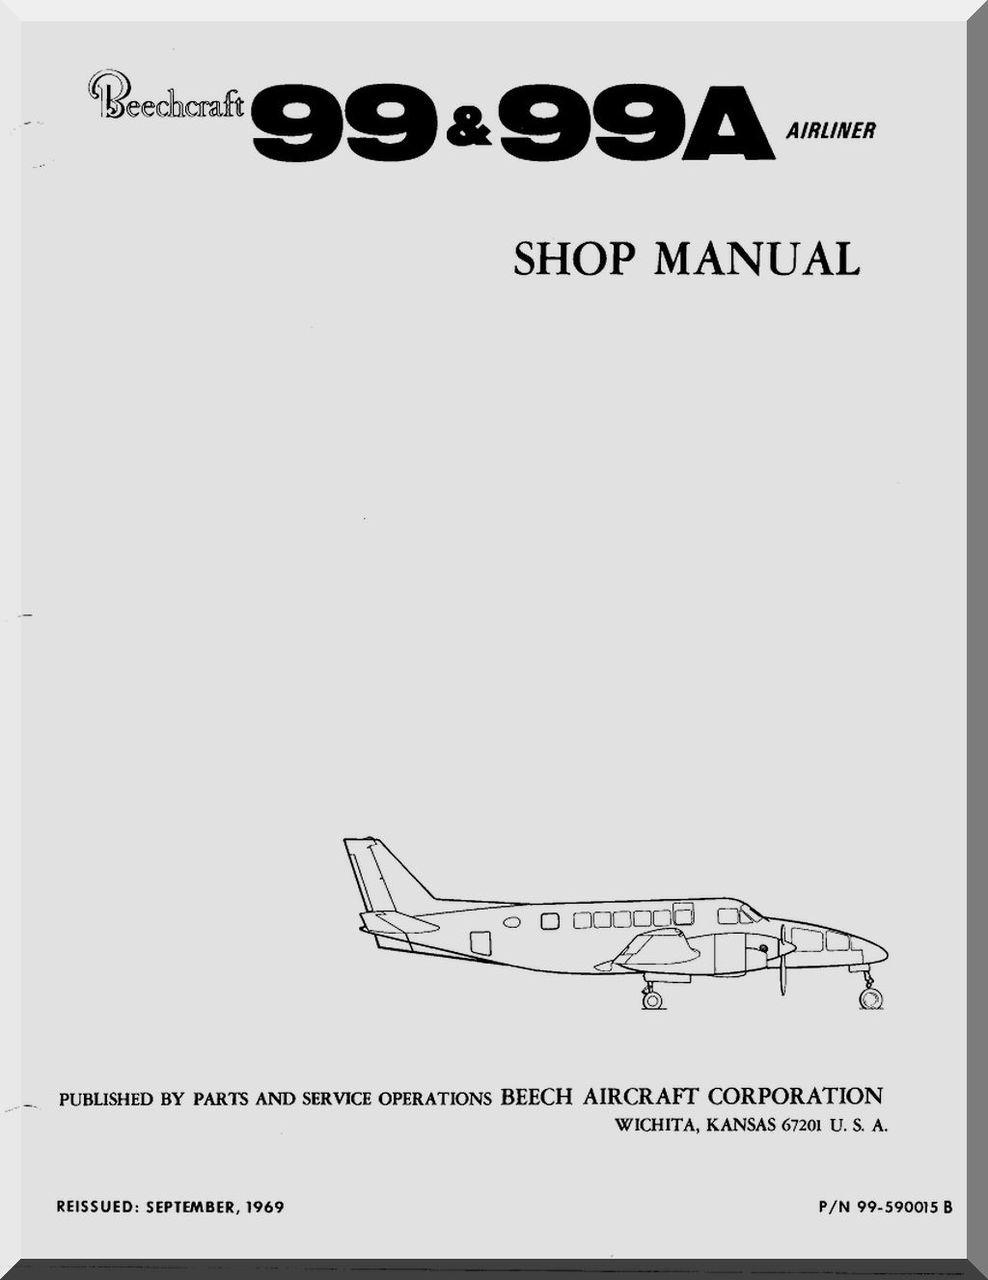 Beechcraft 99 & 99 A Aircraft Parts Service Shop Manual